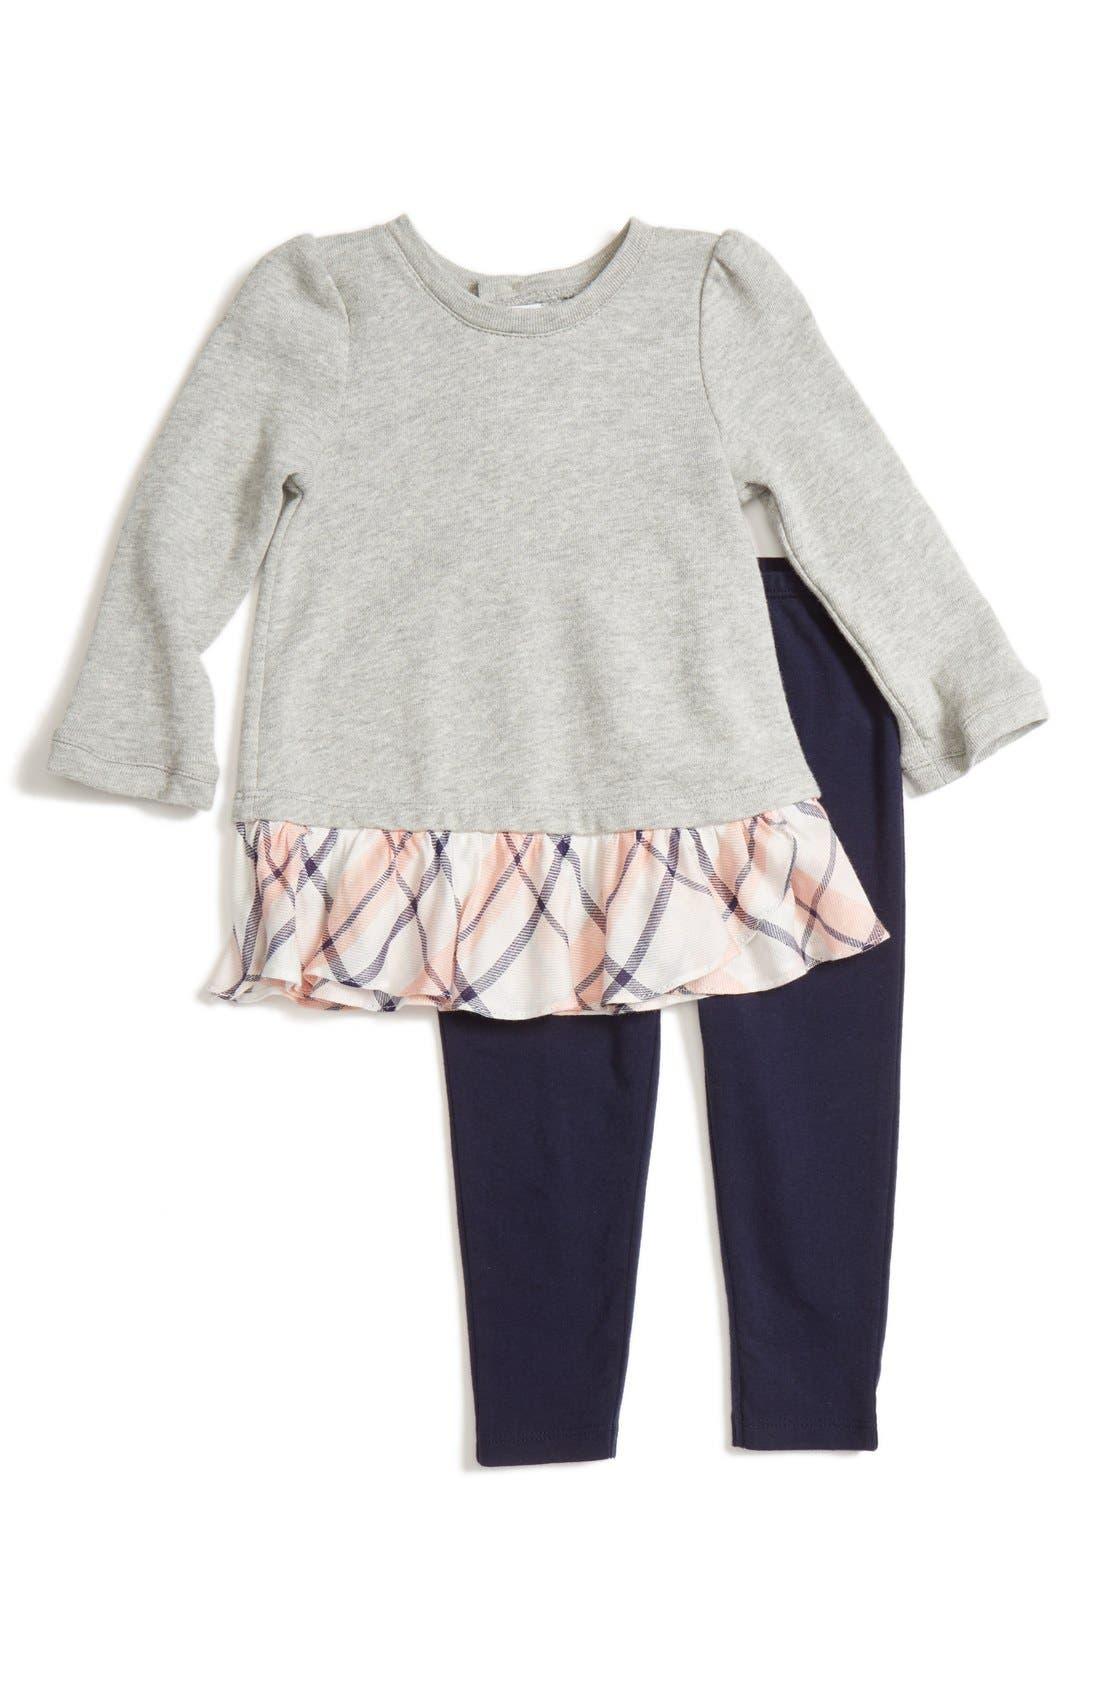 Alternate Image 1 Selected - Splendid Plaid Peplum Top & Leggings Set (Baby Girls)